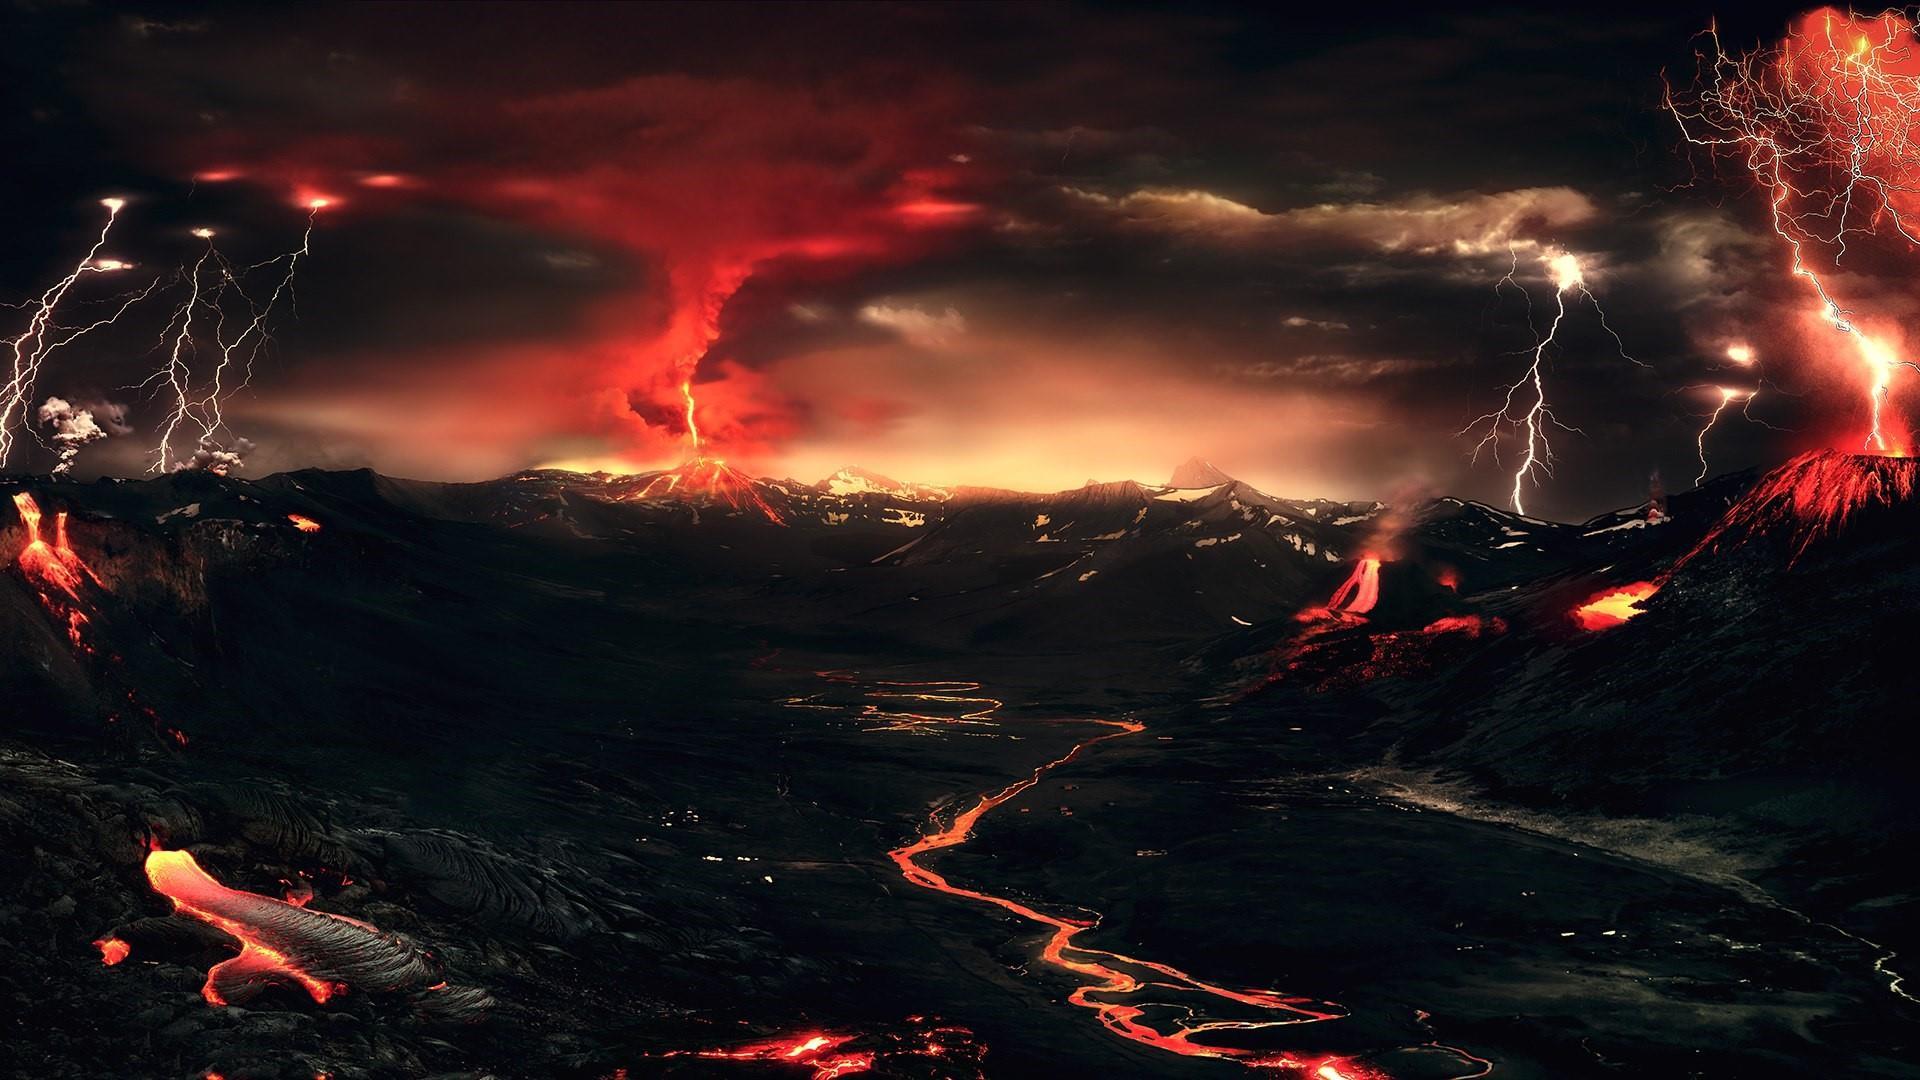 Volcanic Landscape wallpaper